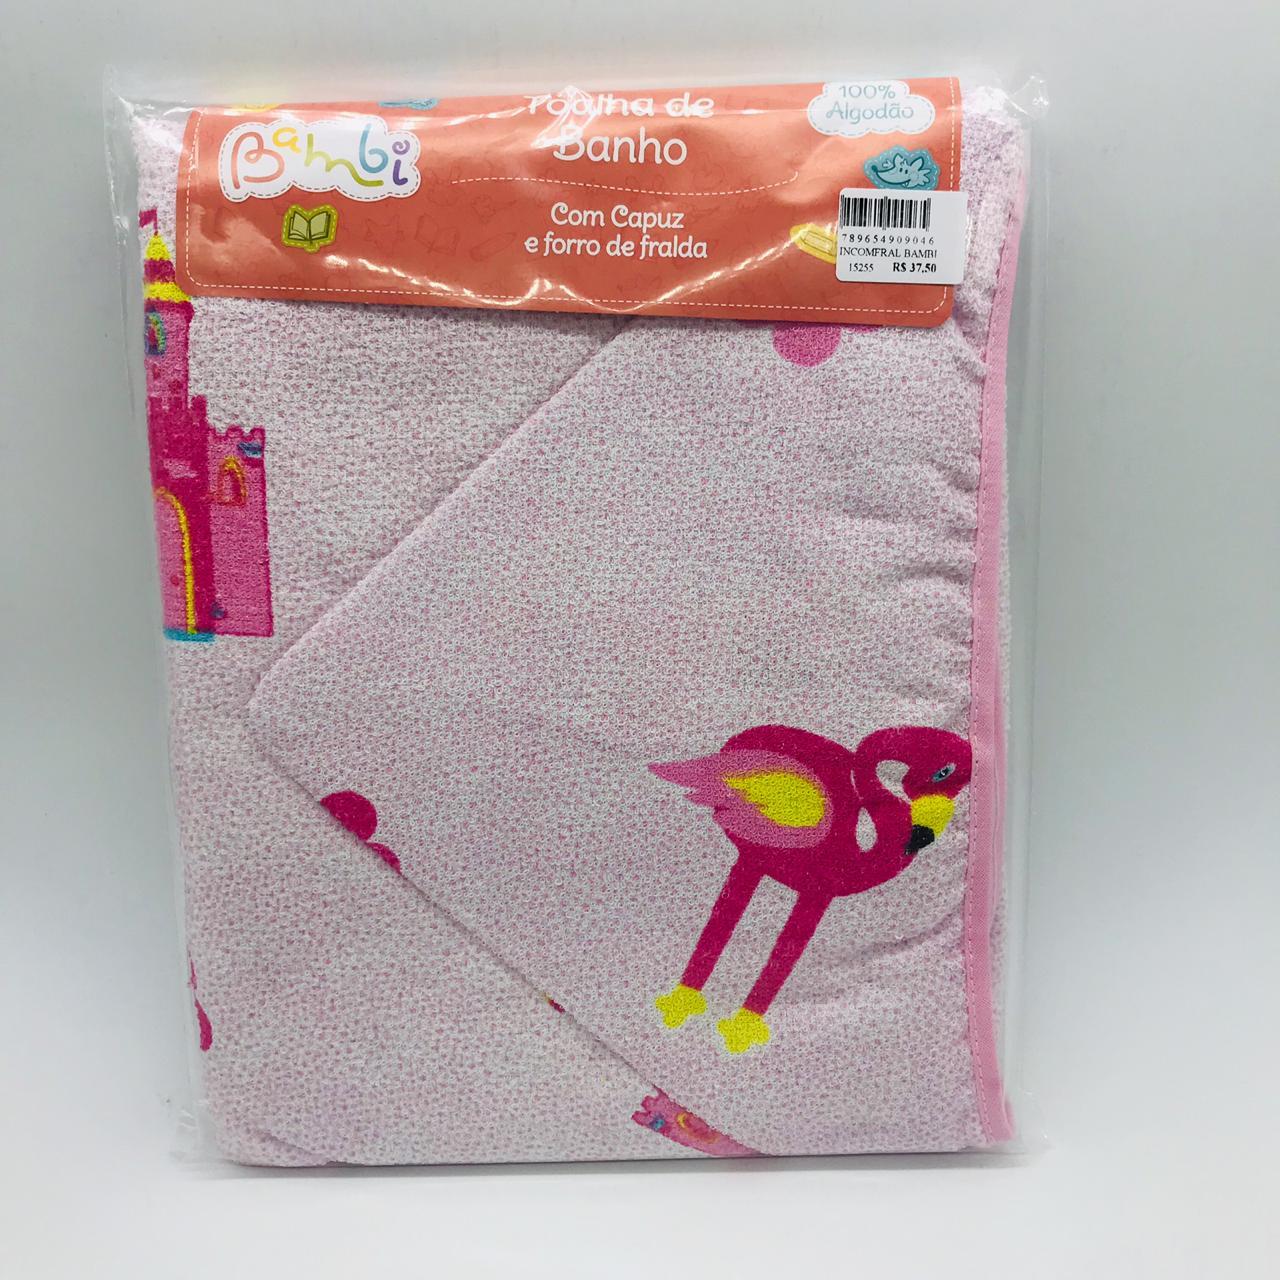 Toalha Capuz Fralda Flamingo - Bambi Incomfral Ref 02003302020014